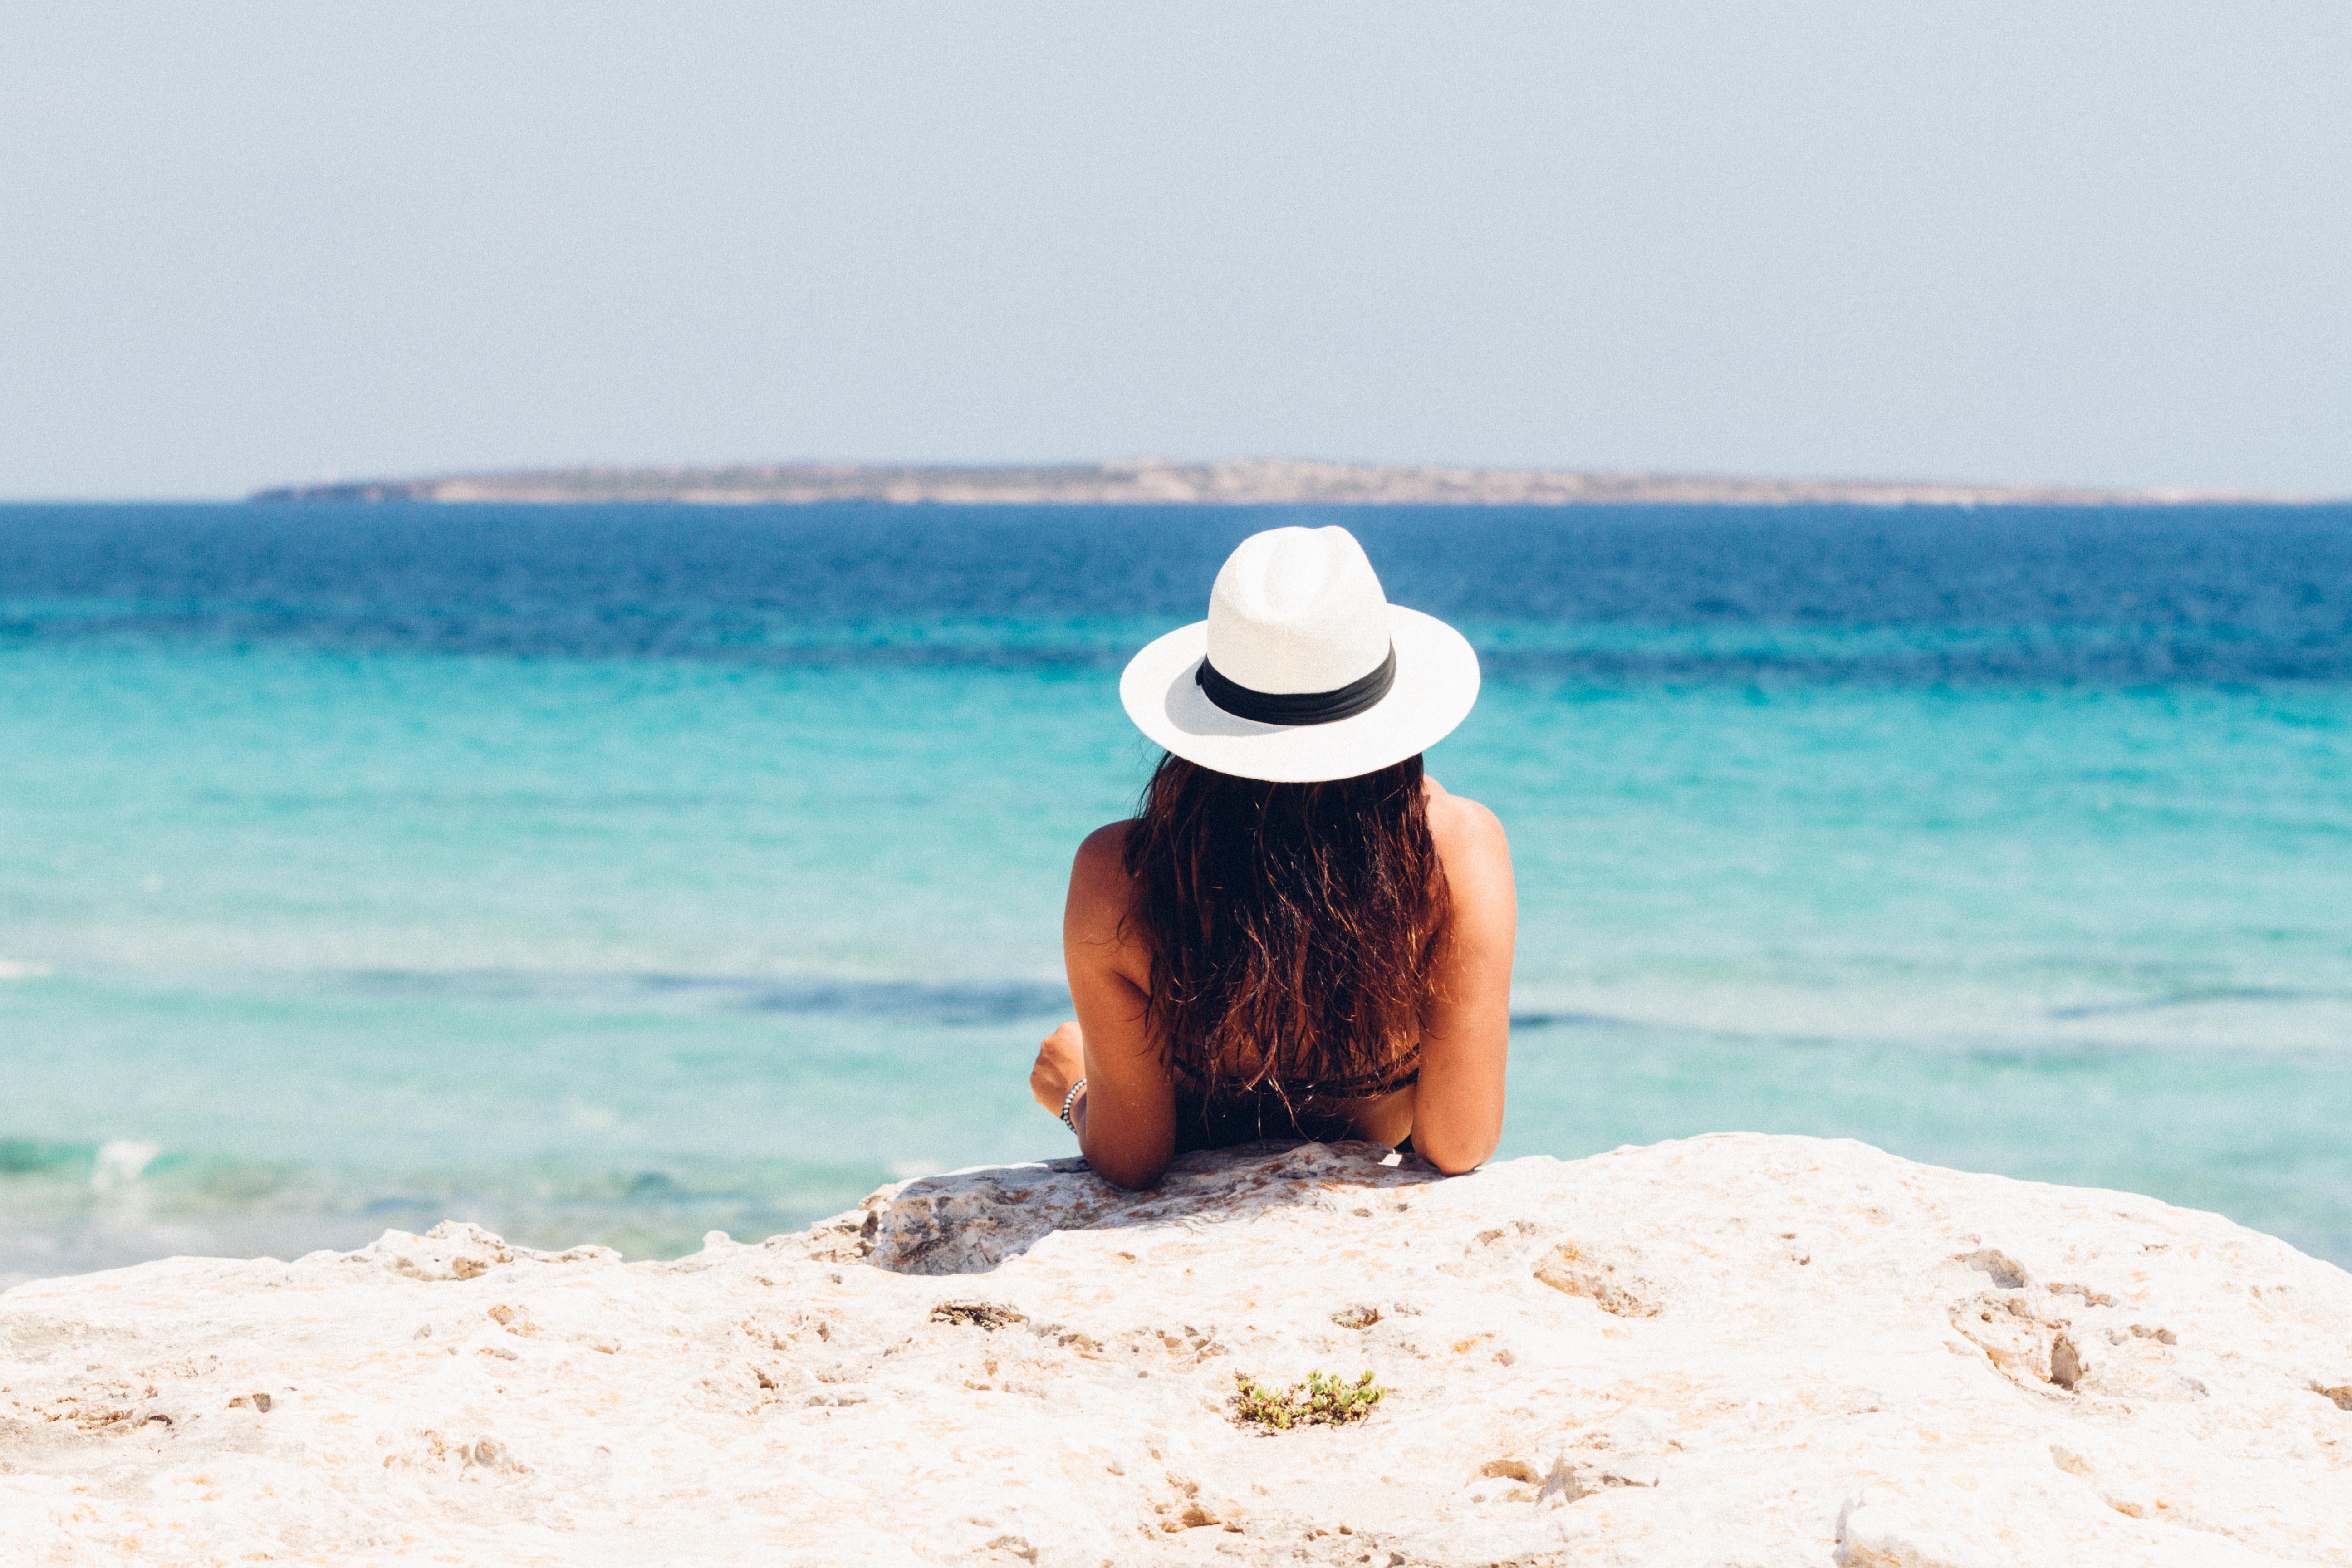 Woman lying on a beach wearing a white sun hat